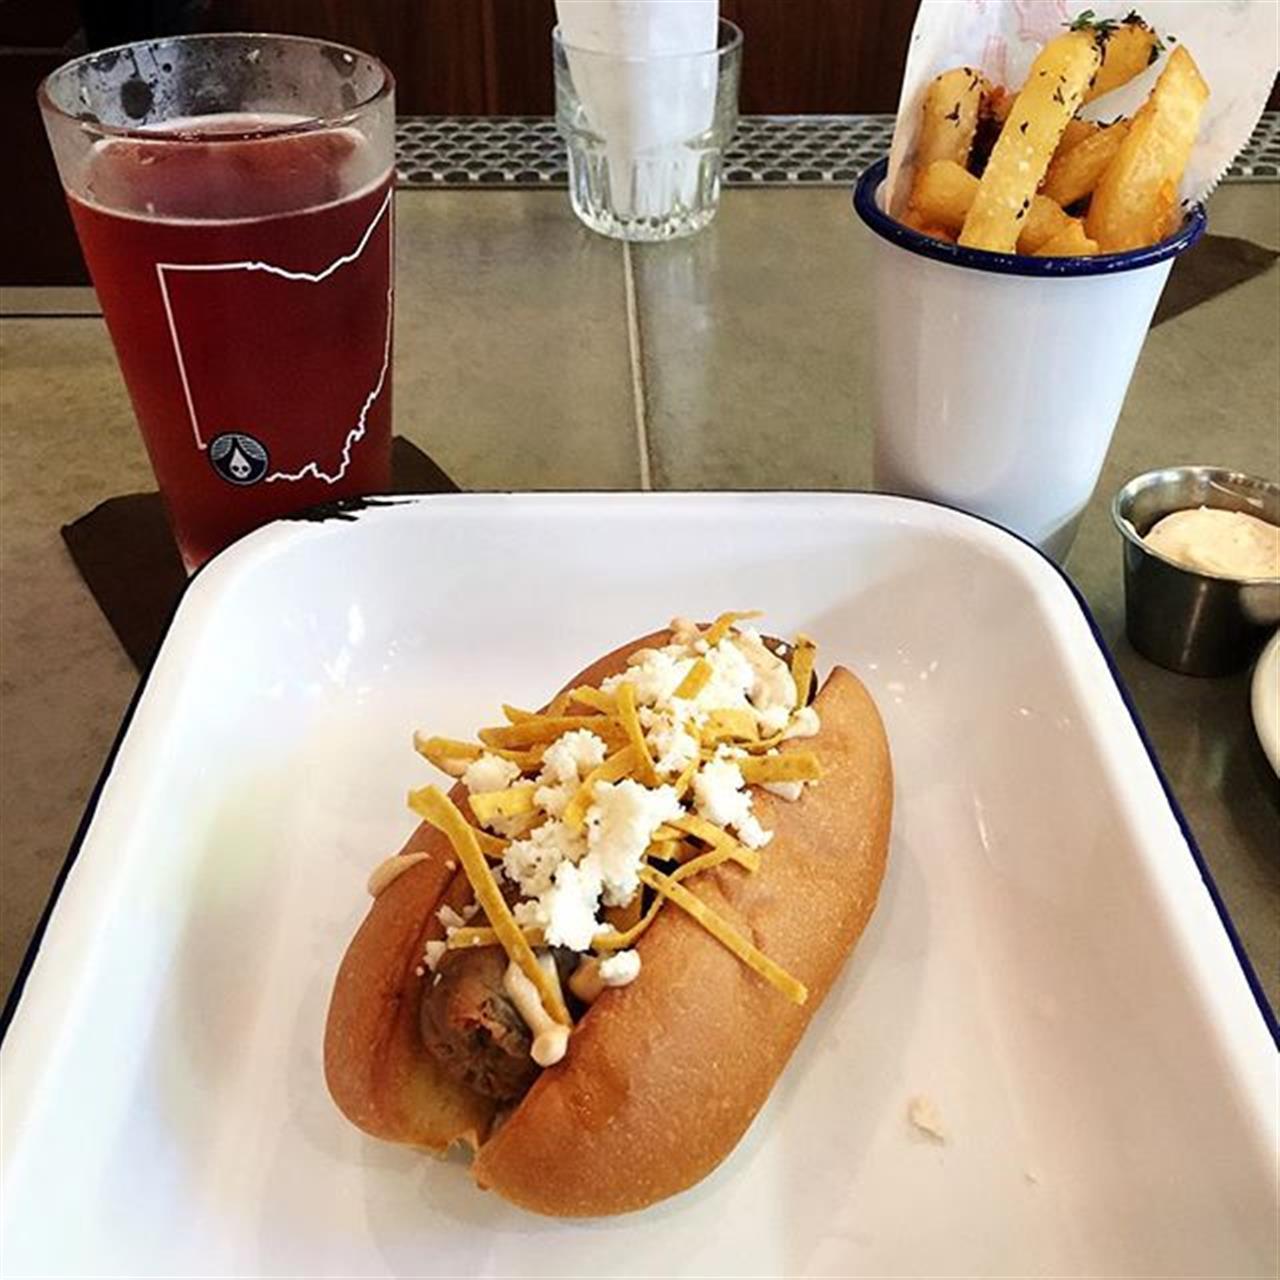 Celebrating the weekend at one of @blueashohio's newest restaurants, @senatepub in @summitparkblueash! #sibcycline #homewithsibcycline #fridayvibes #weekend #leadingrelocal